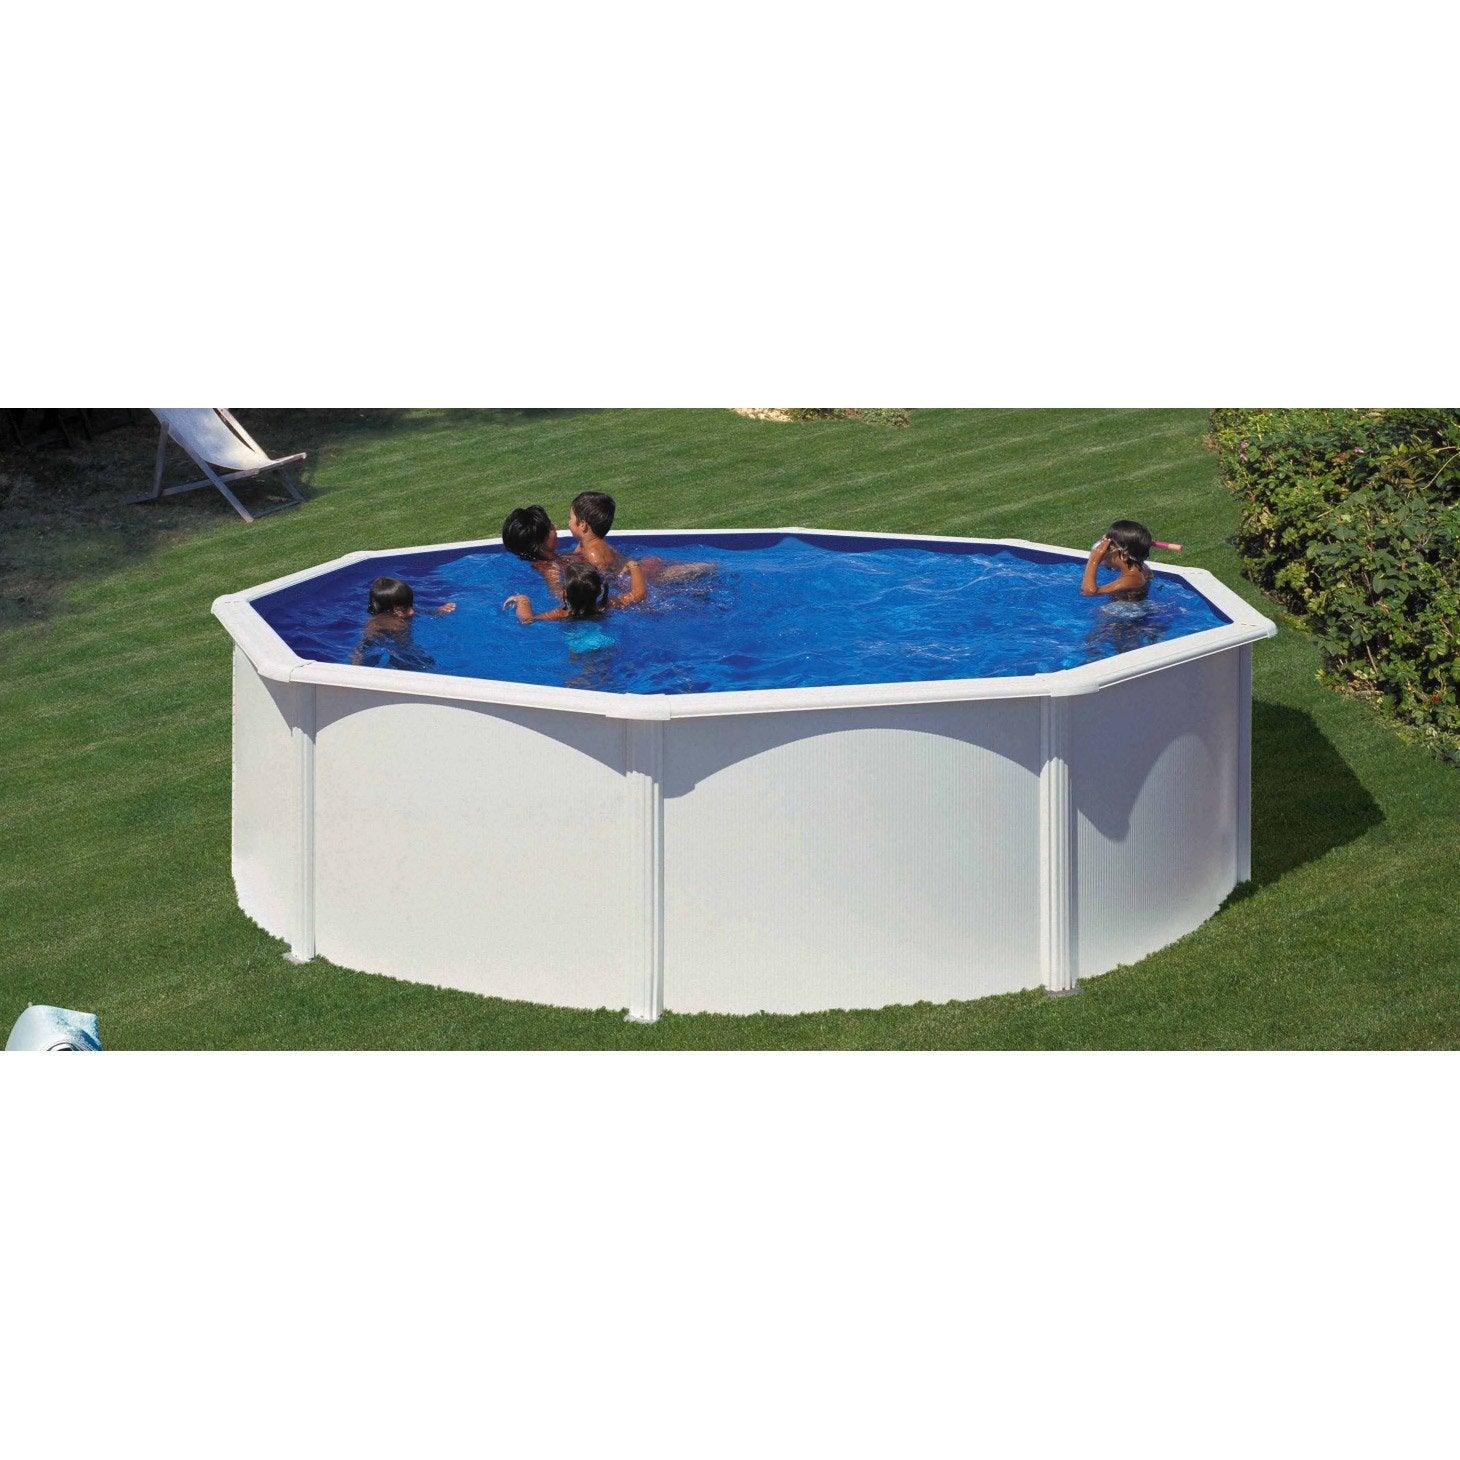 piscine hors sol acier san clara gre diam 5 7 x h 1 2 m. Black Bedroom Furniture Sets. Home Design Ideas